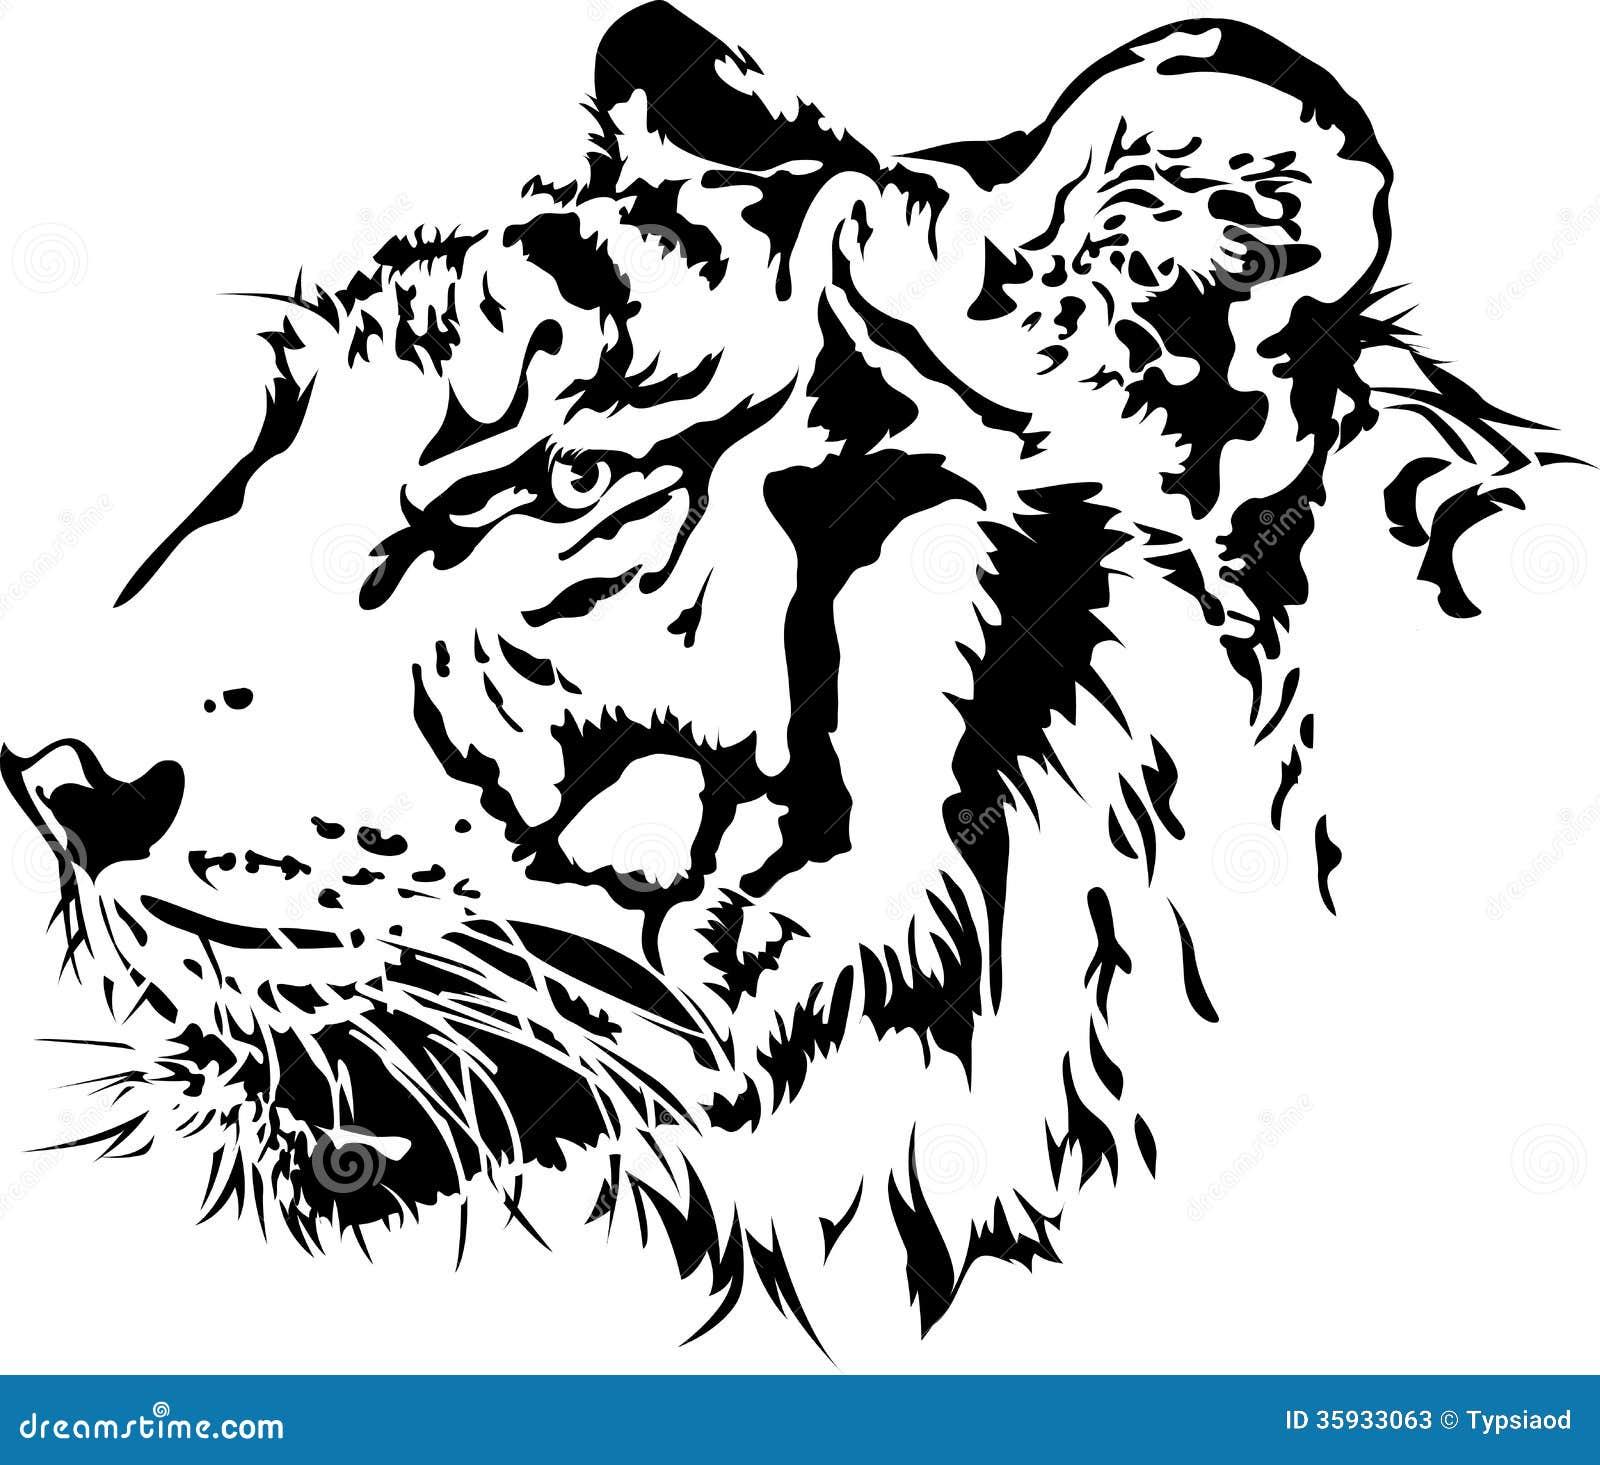 Line Art With Mr E : Silhouette principale de tigre illustration vecteur